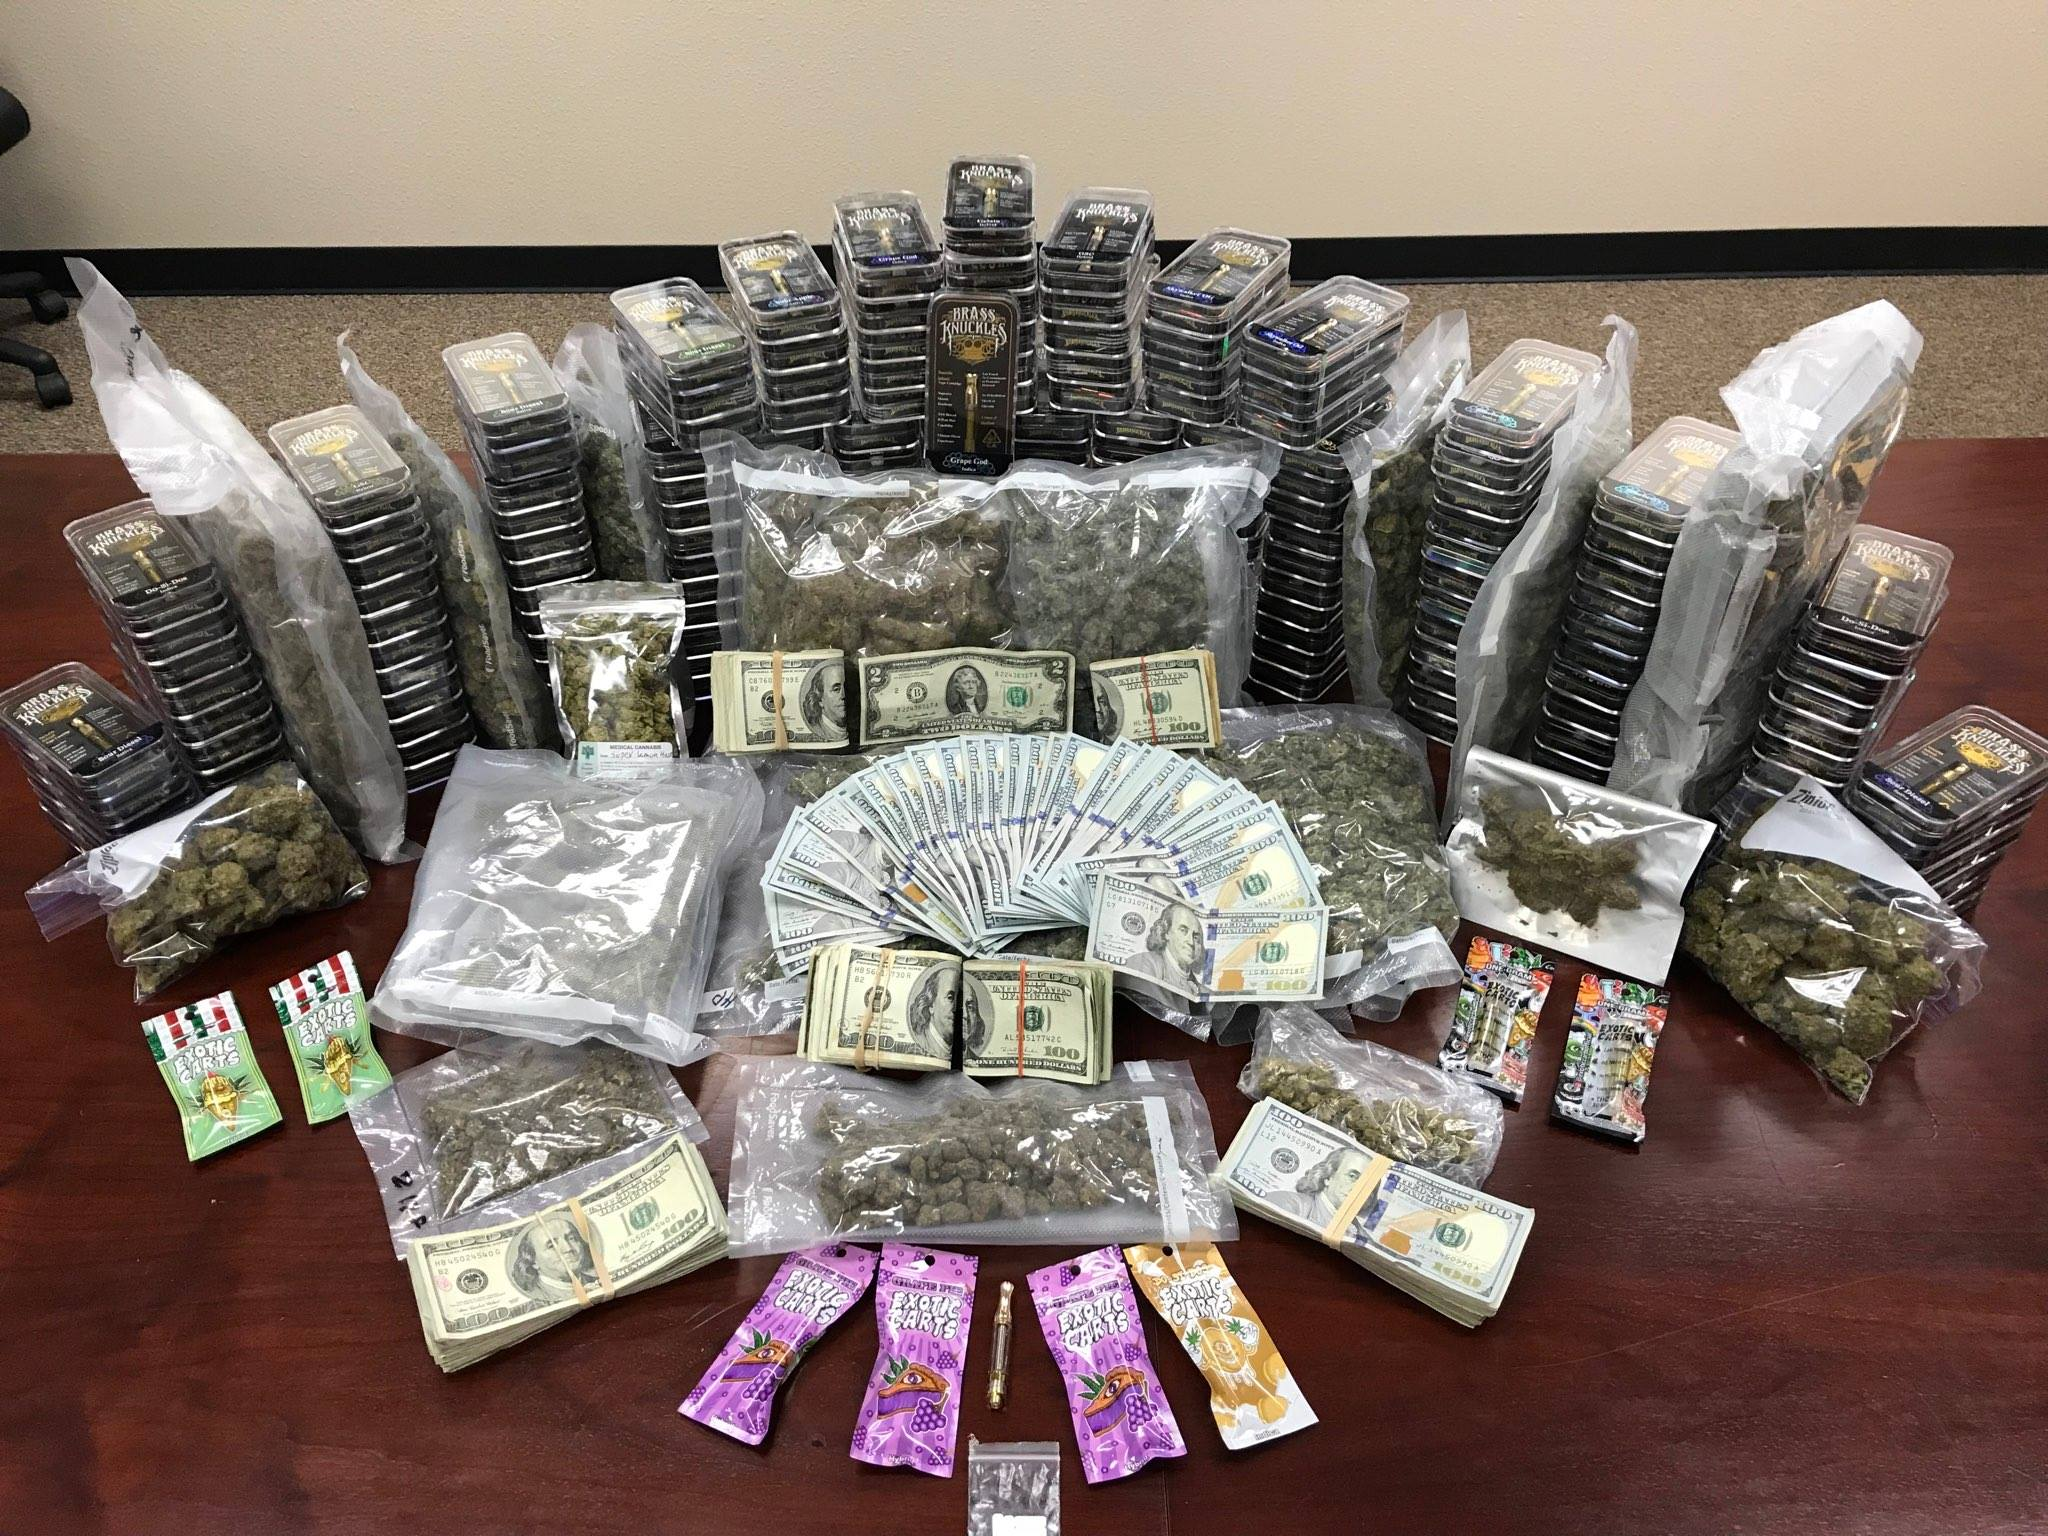 Texas Task Force Arrest Man, Seize $33K in Illegal Drugs in